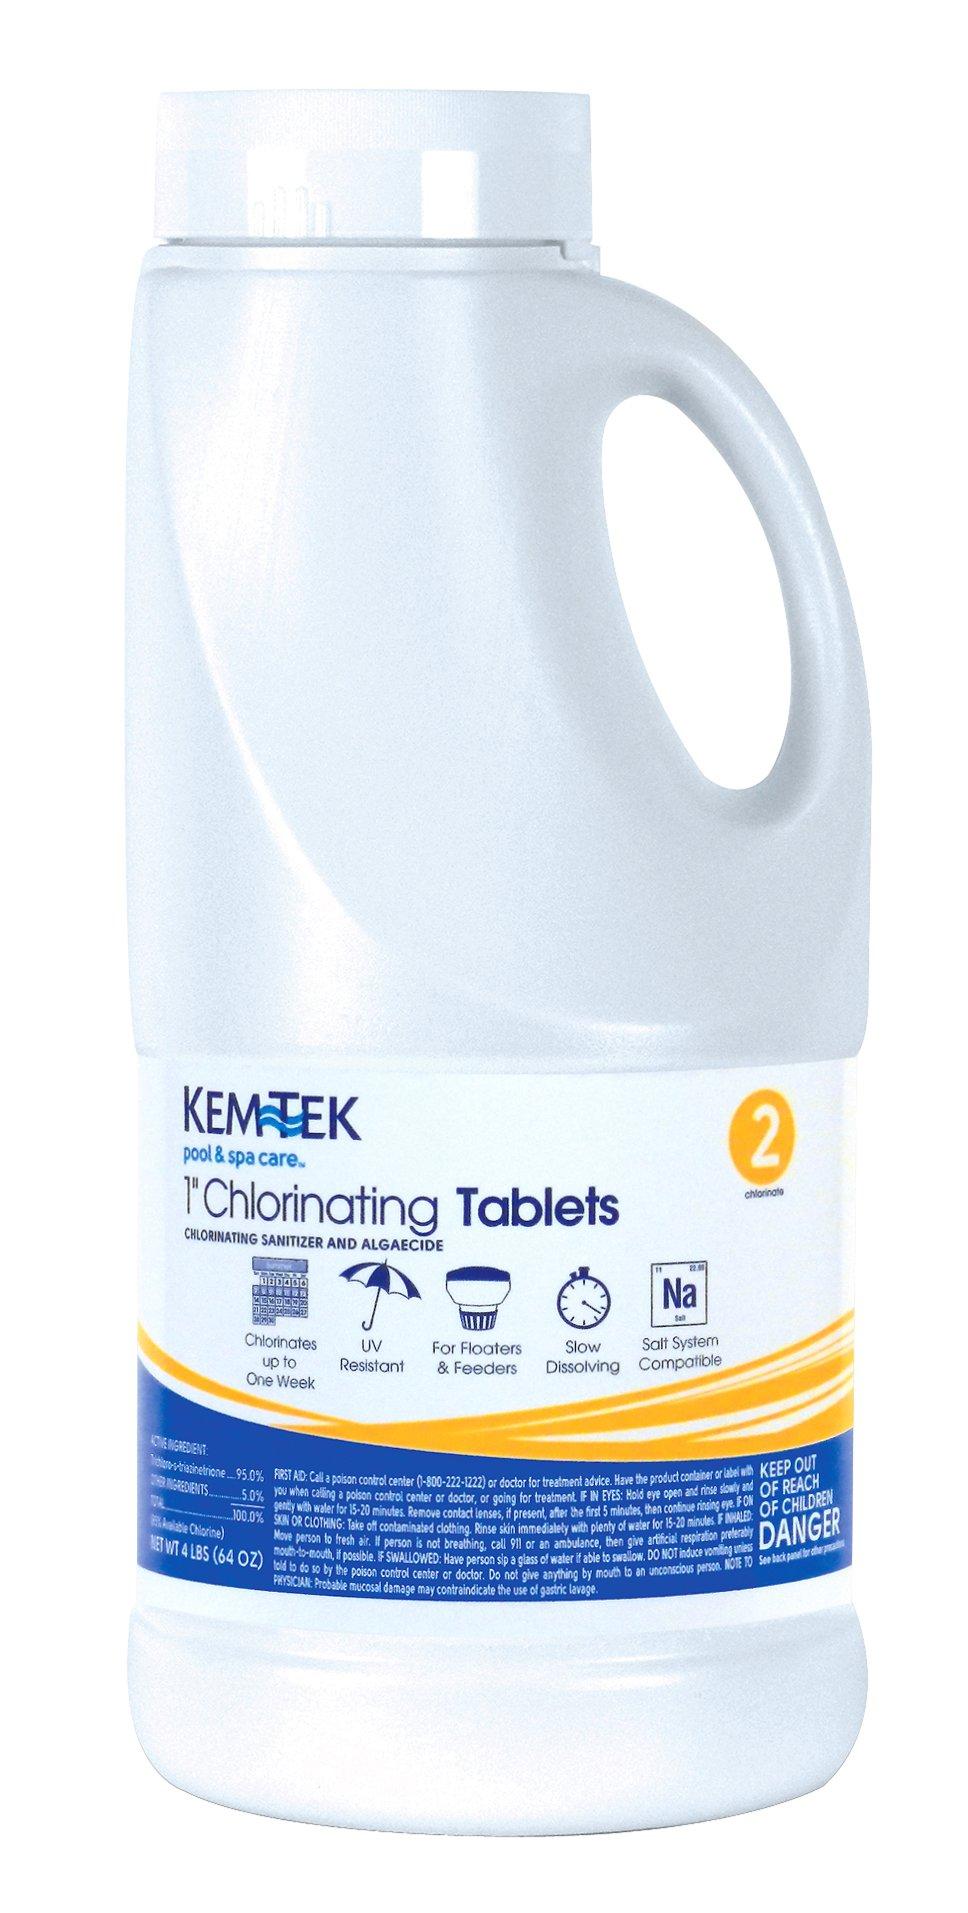 Kem-Tek 177 1-Inch Chlorinating Tablets for Pool and Spa, 4-Pound by Kem-Tek